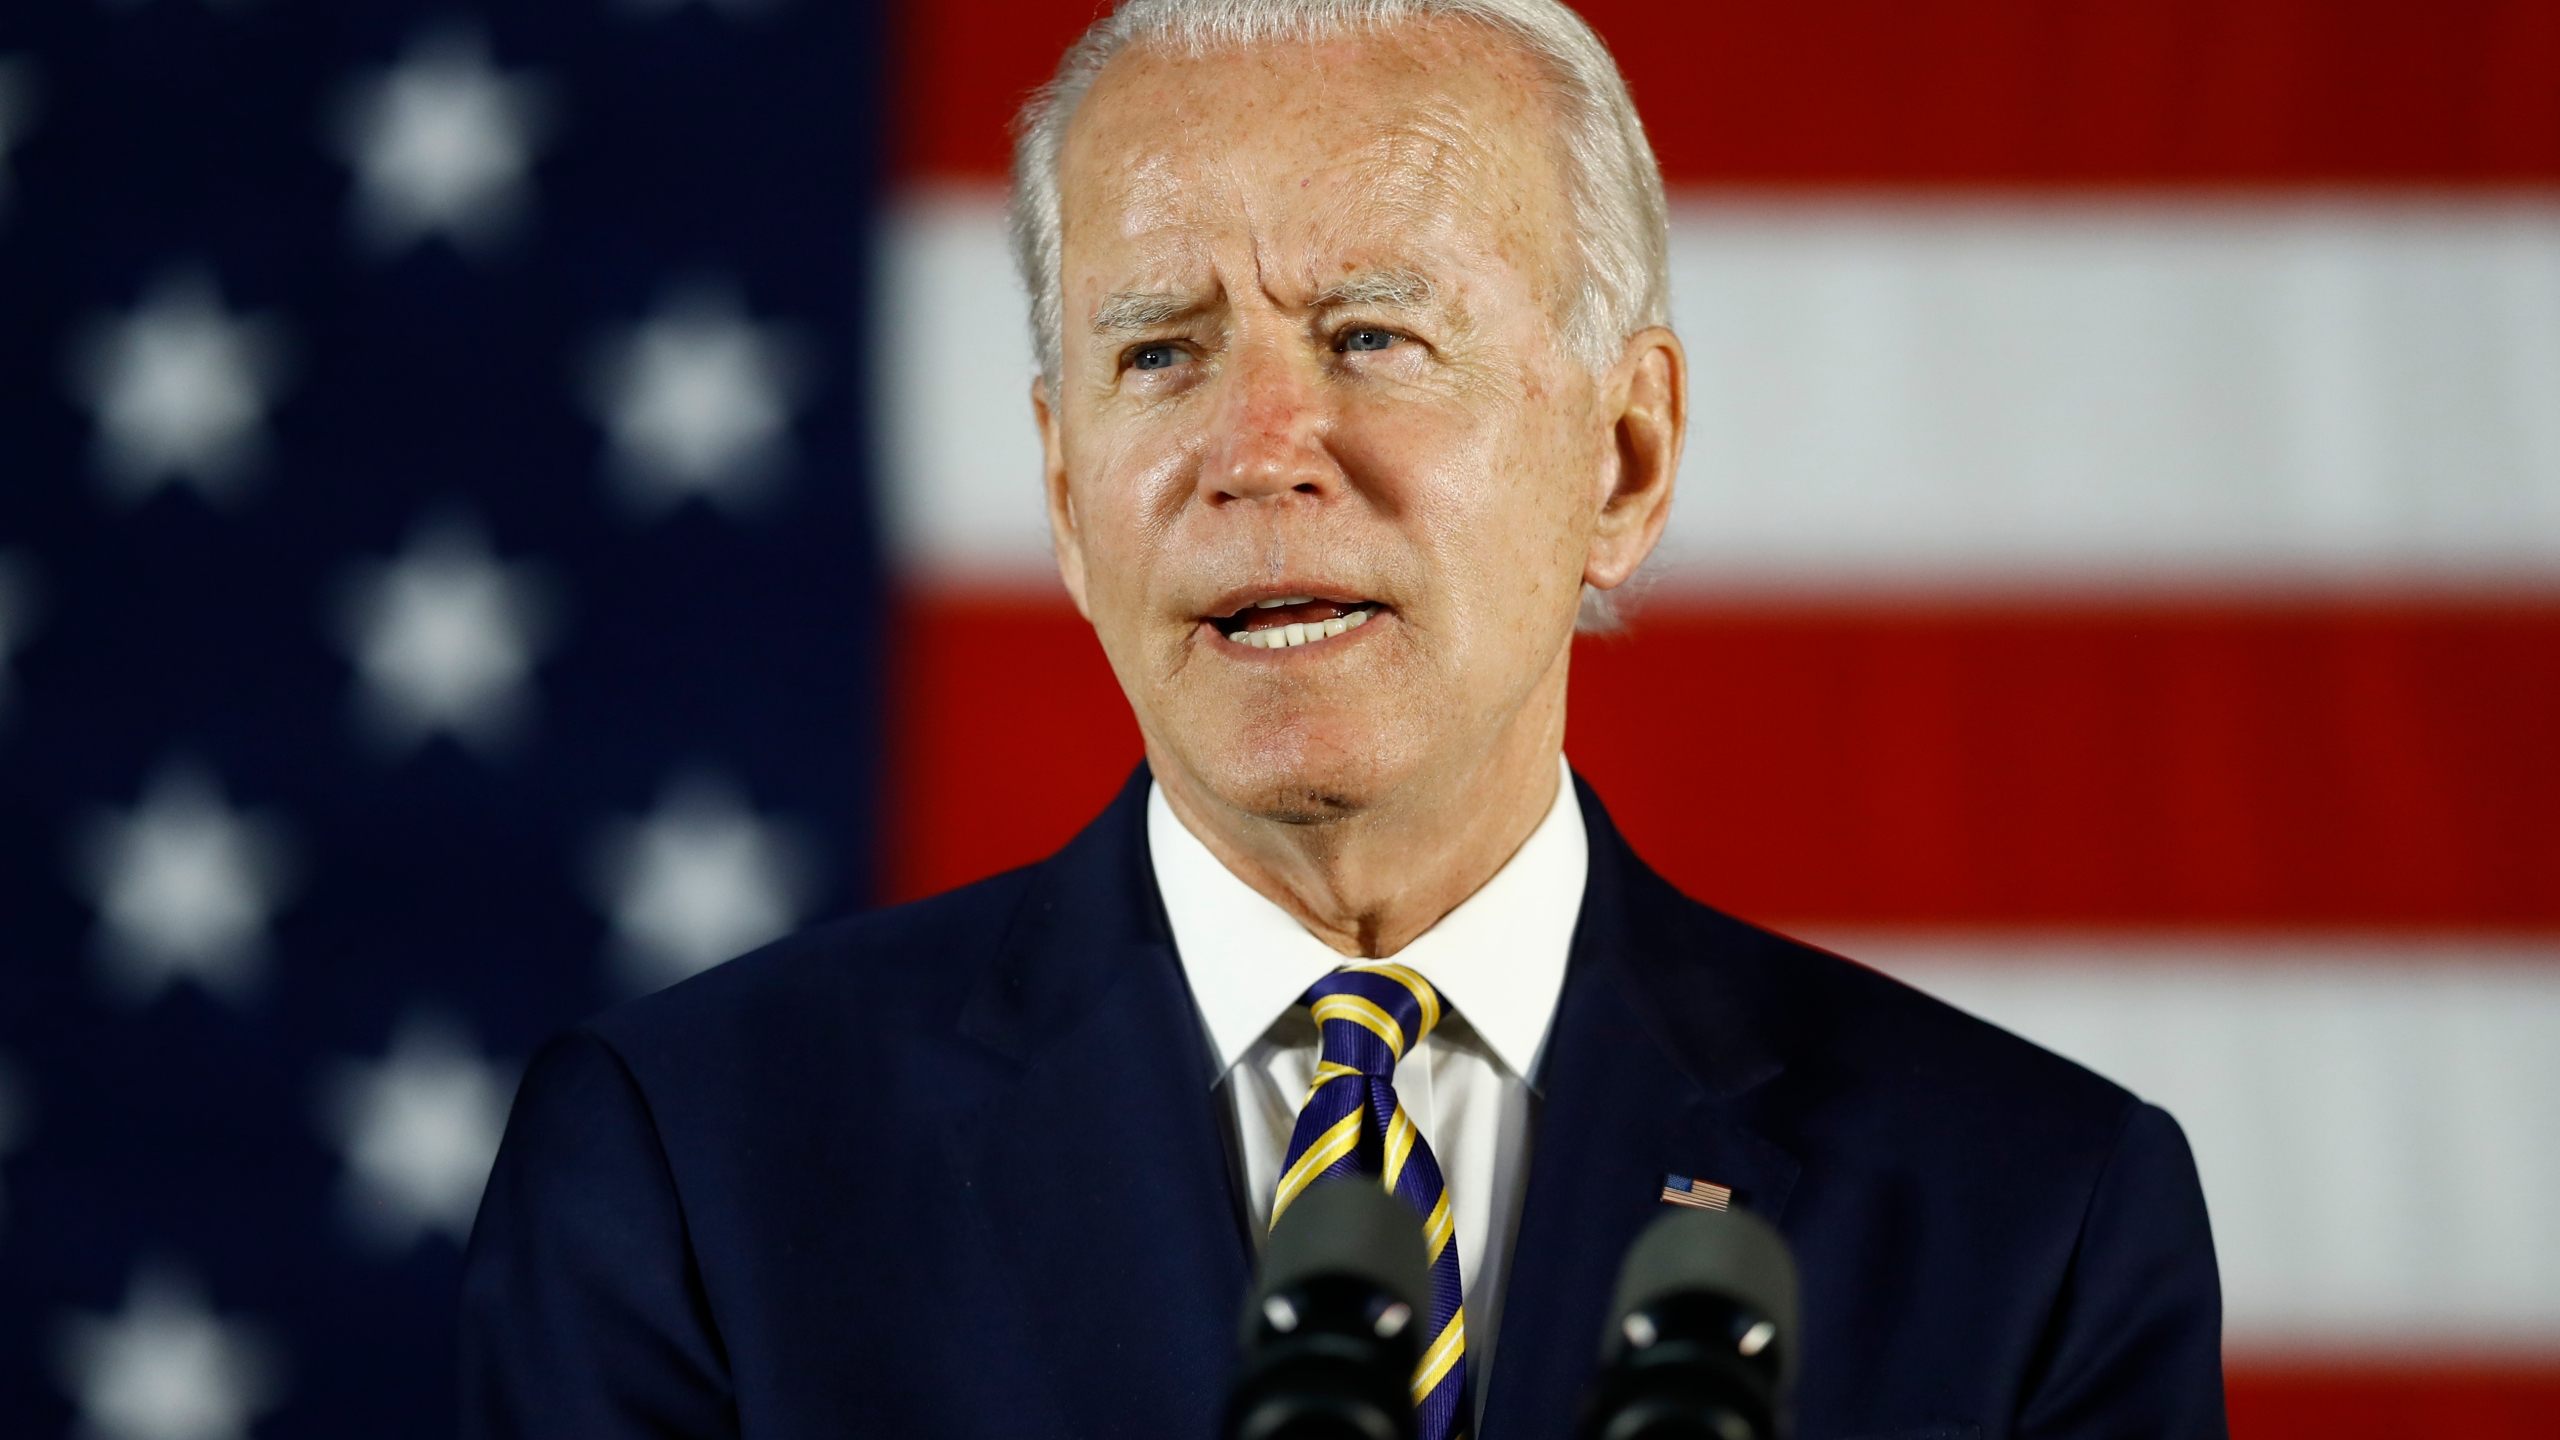 In this June 17, 2020, file photo, Democratic presidential candidate, former Vice President Joe Biden speaks in Darby, Pa. (AP Photo/Matt Slocum)